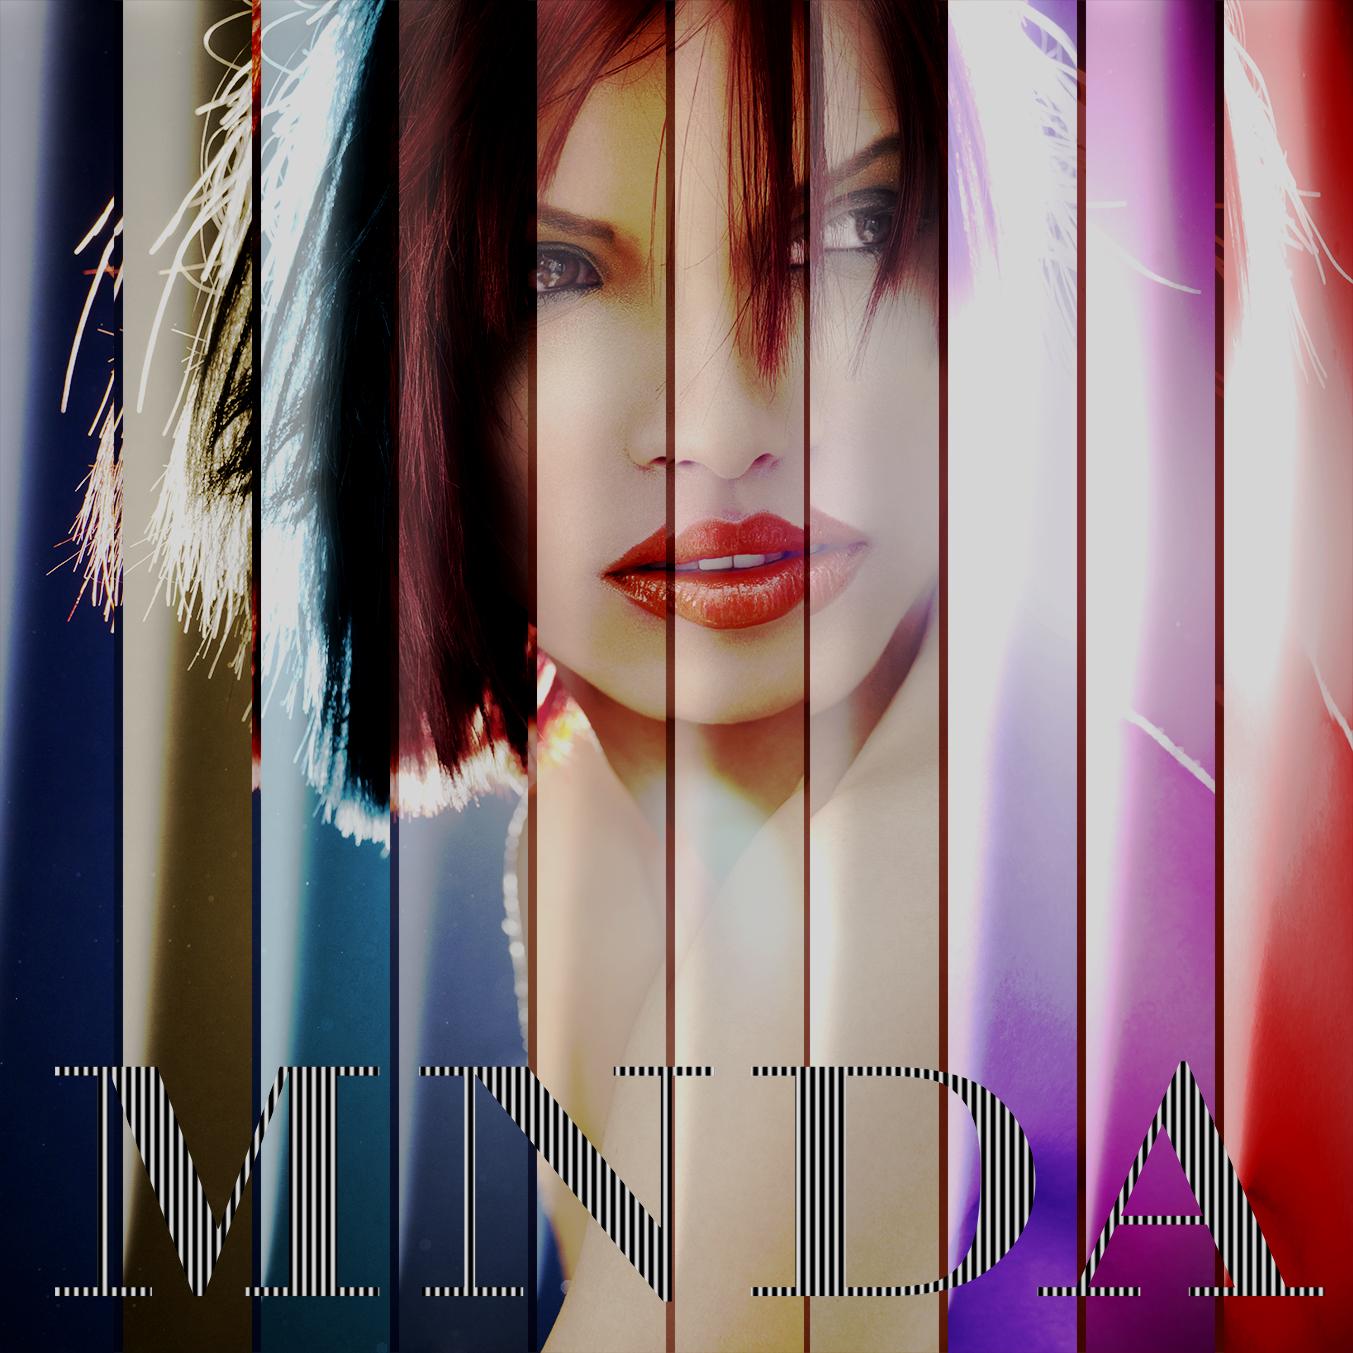 http://3.bp.blogspot.com/-2j3nXFV2MT0/T7nU2iijKSI/AAAAAAAAAnw/ja82w9HcC20/s1600/Madonna+Cover.jpg